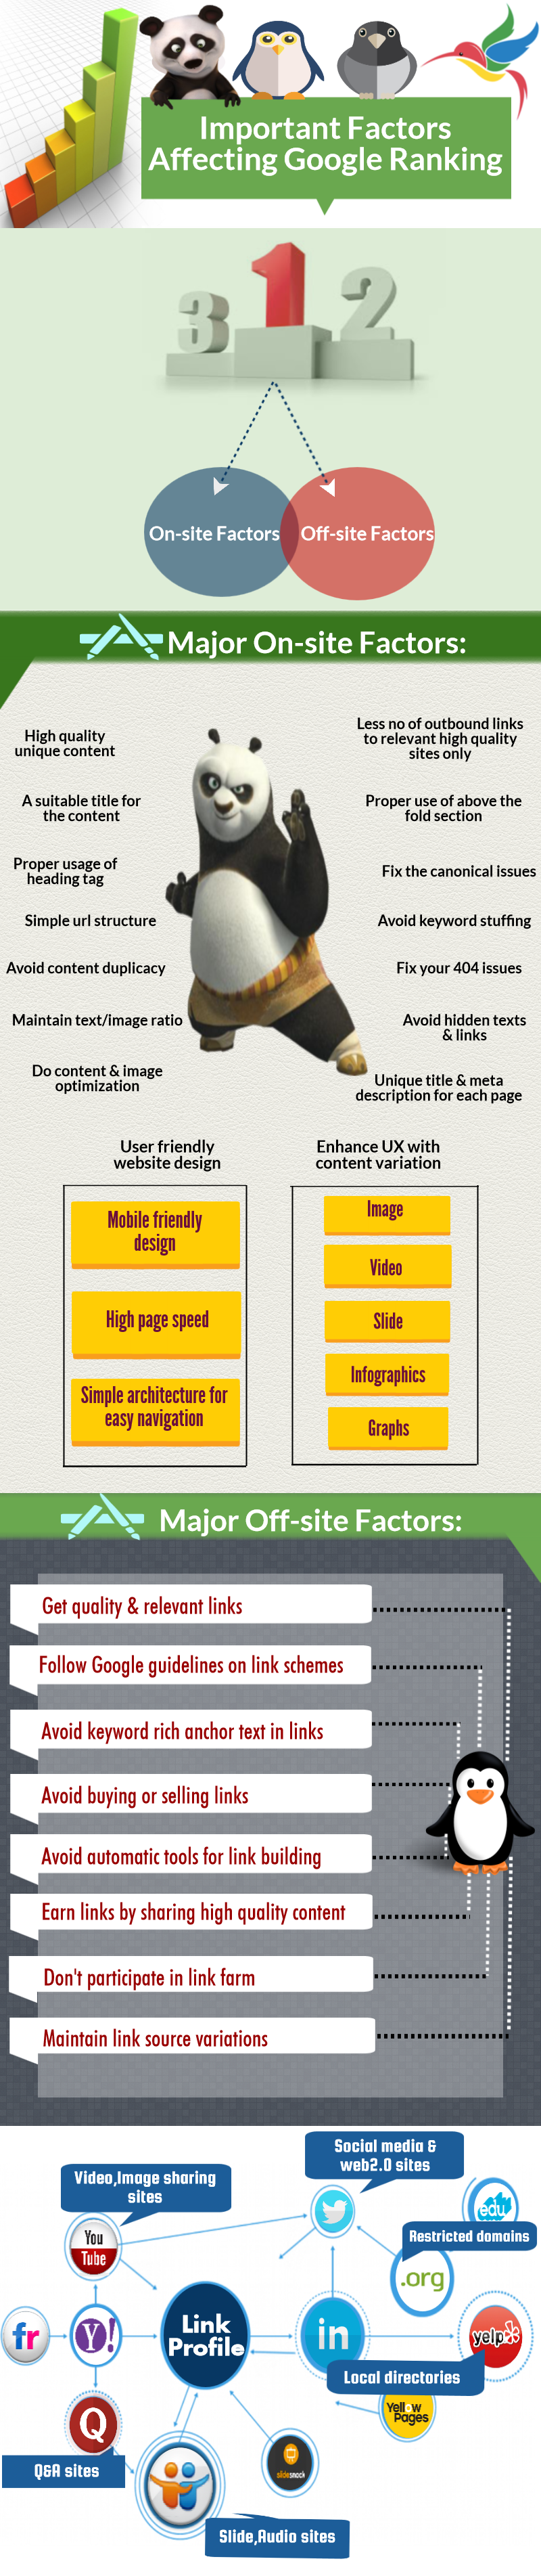 Important Factors Affecting Google Ranking